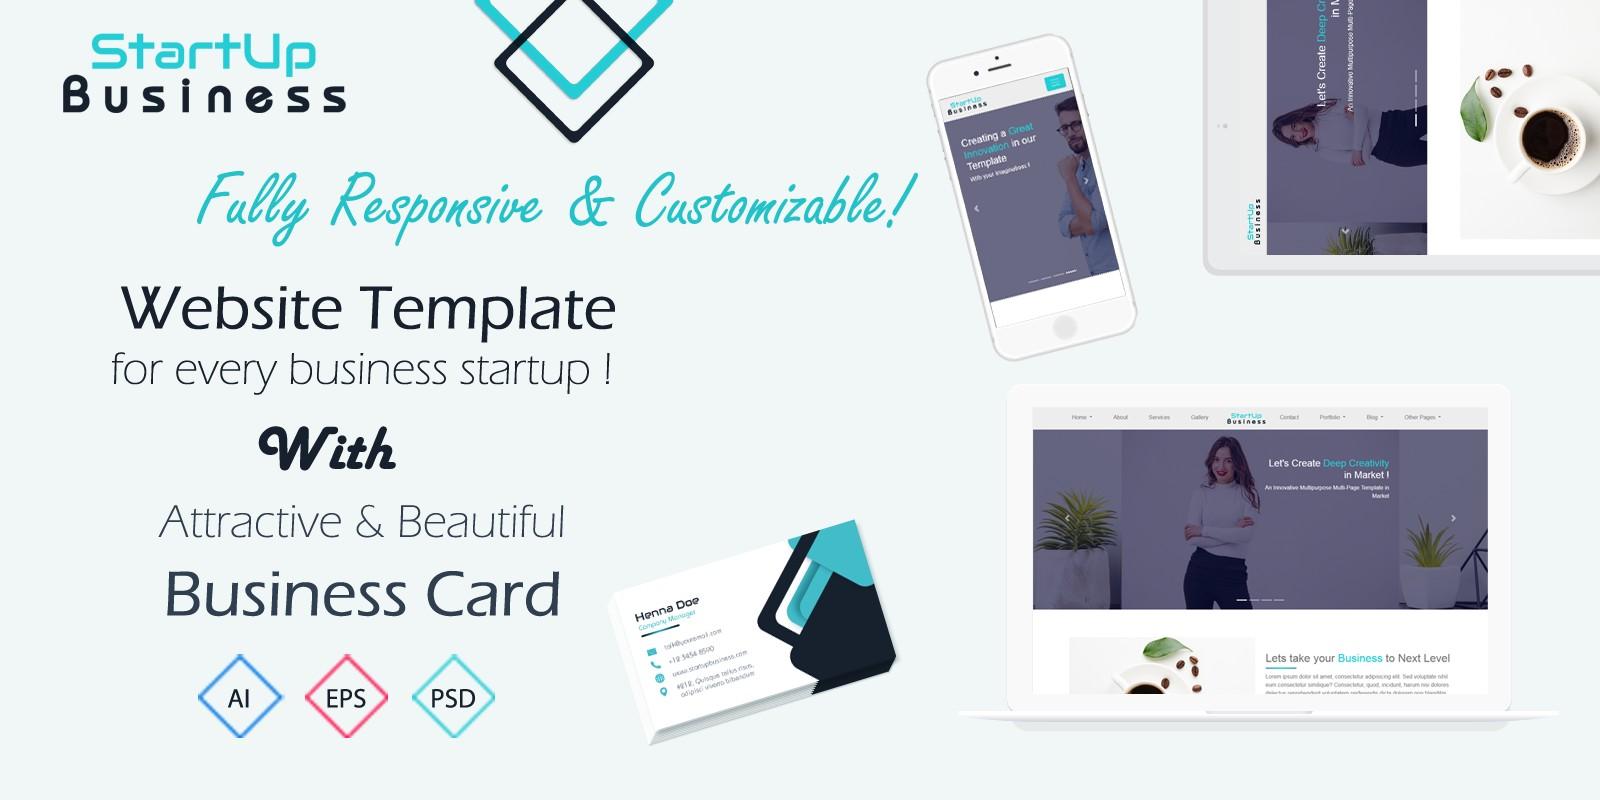 StartUp Business - Responsive Website Template